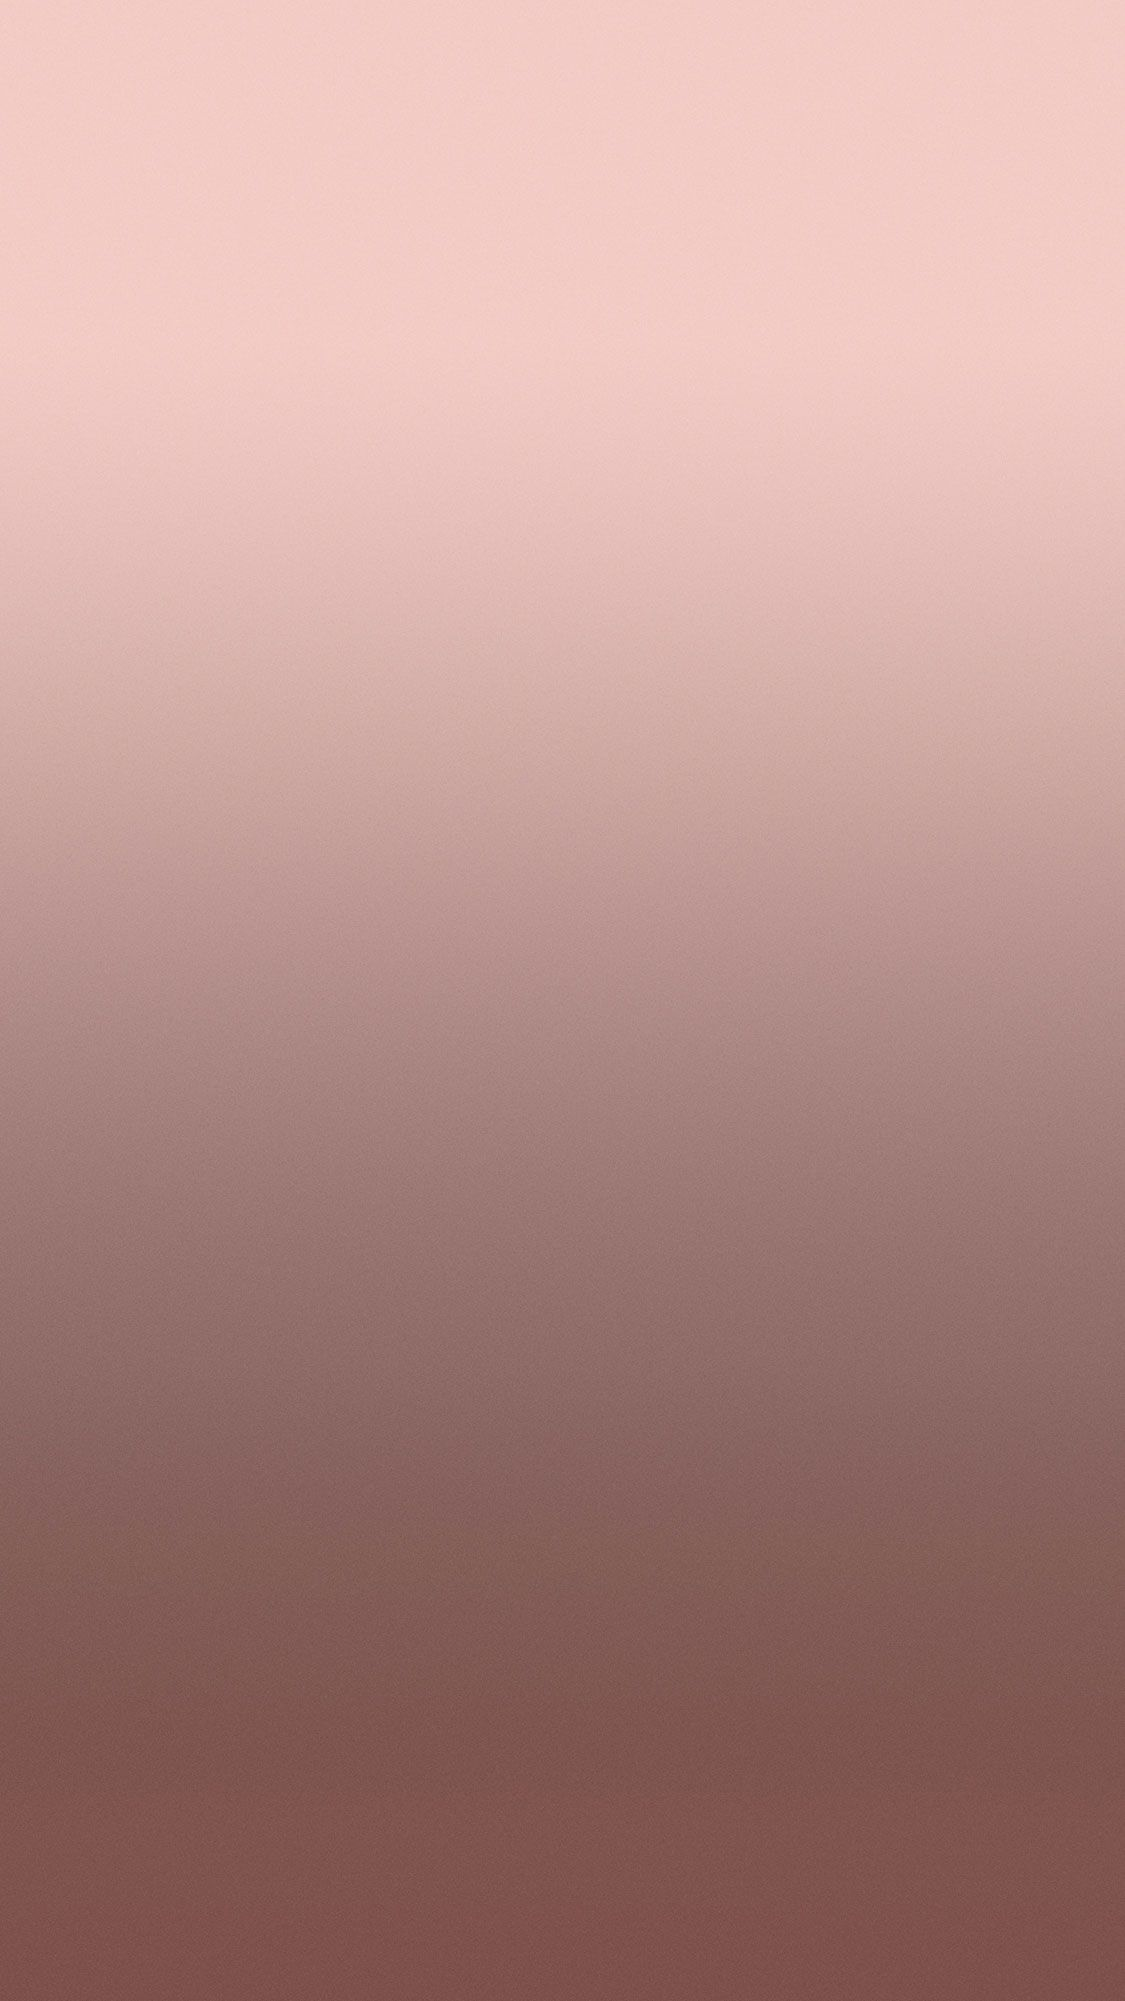 Rose Gold Iphone6s Wallpaper Hd Wallpapers Pinterest